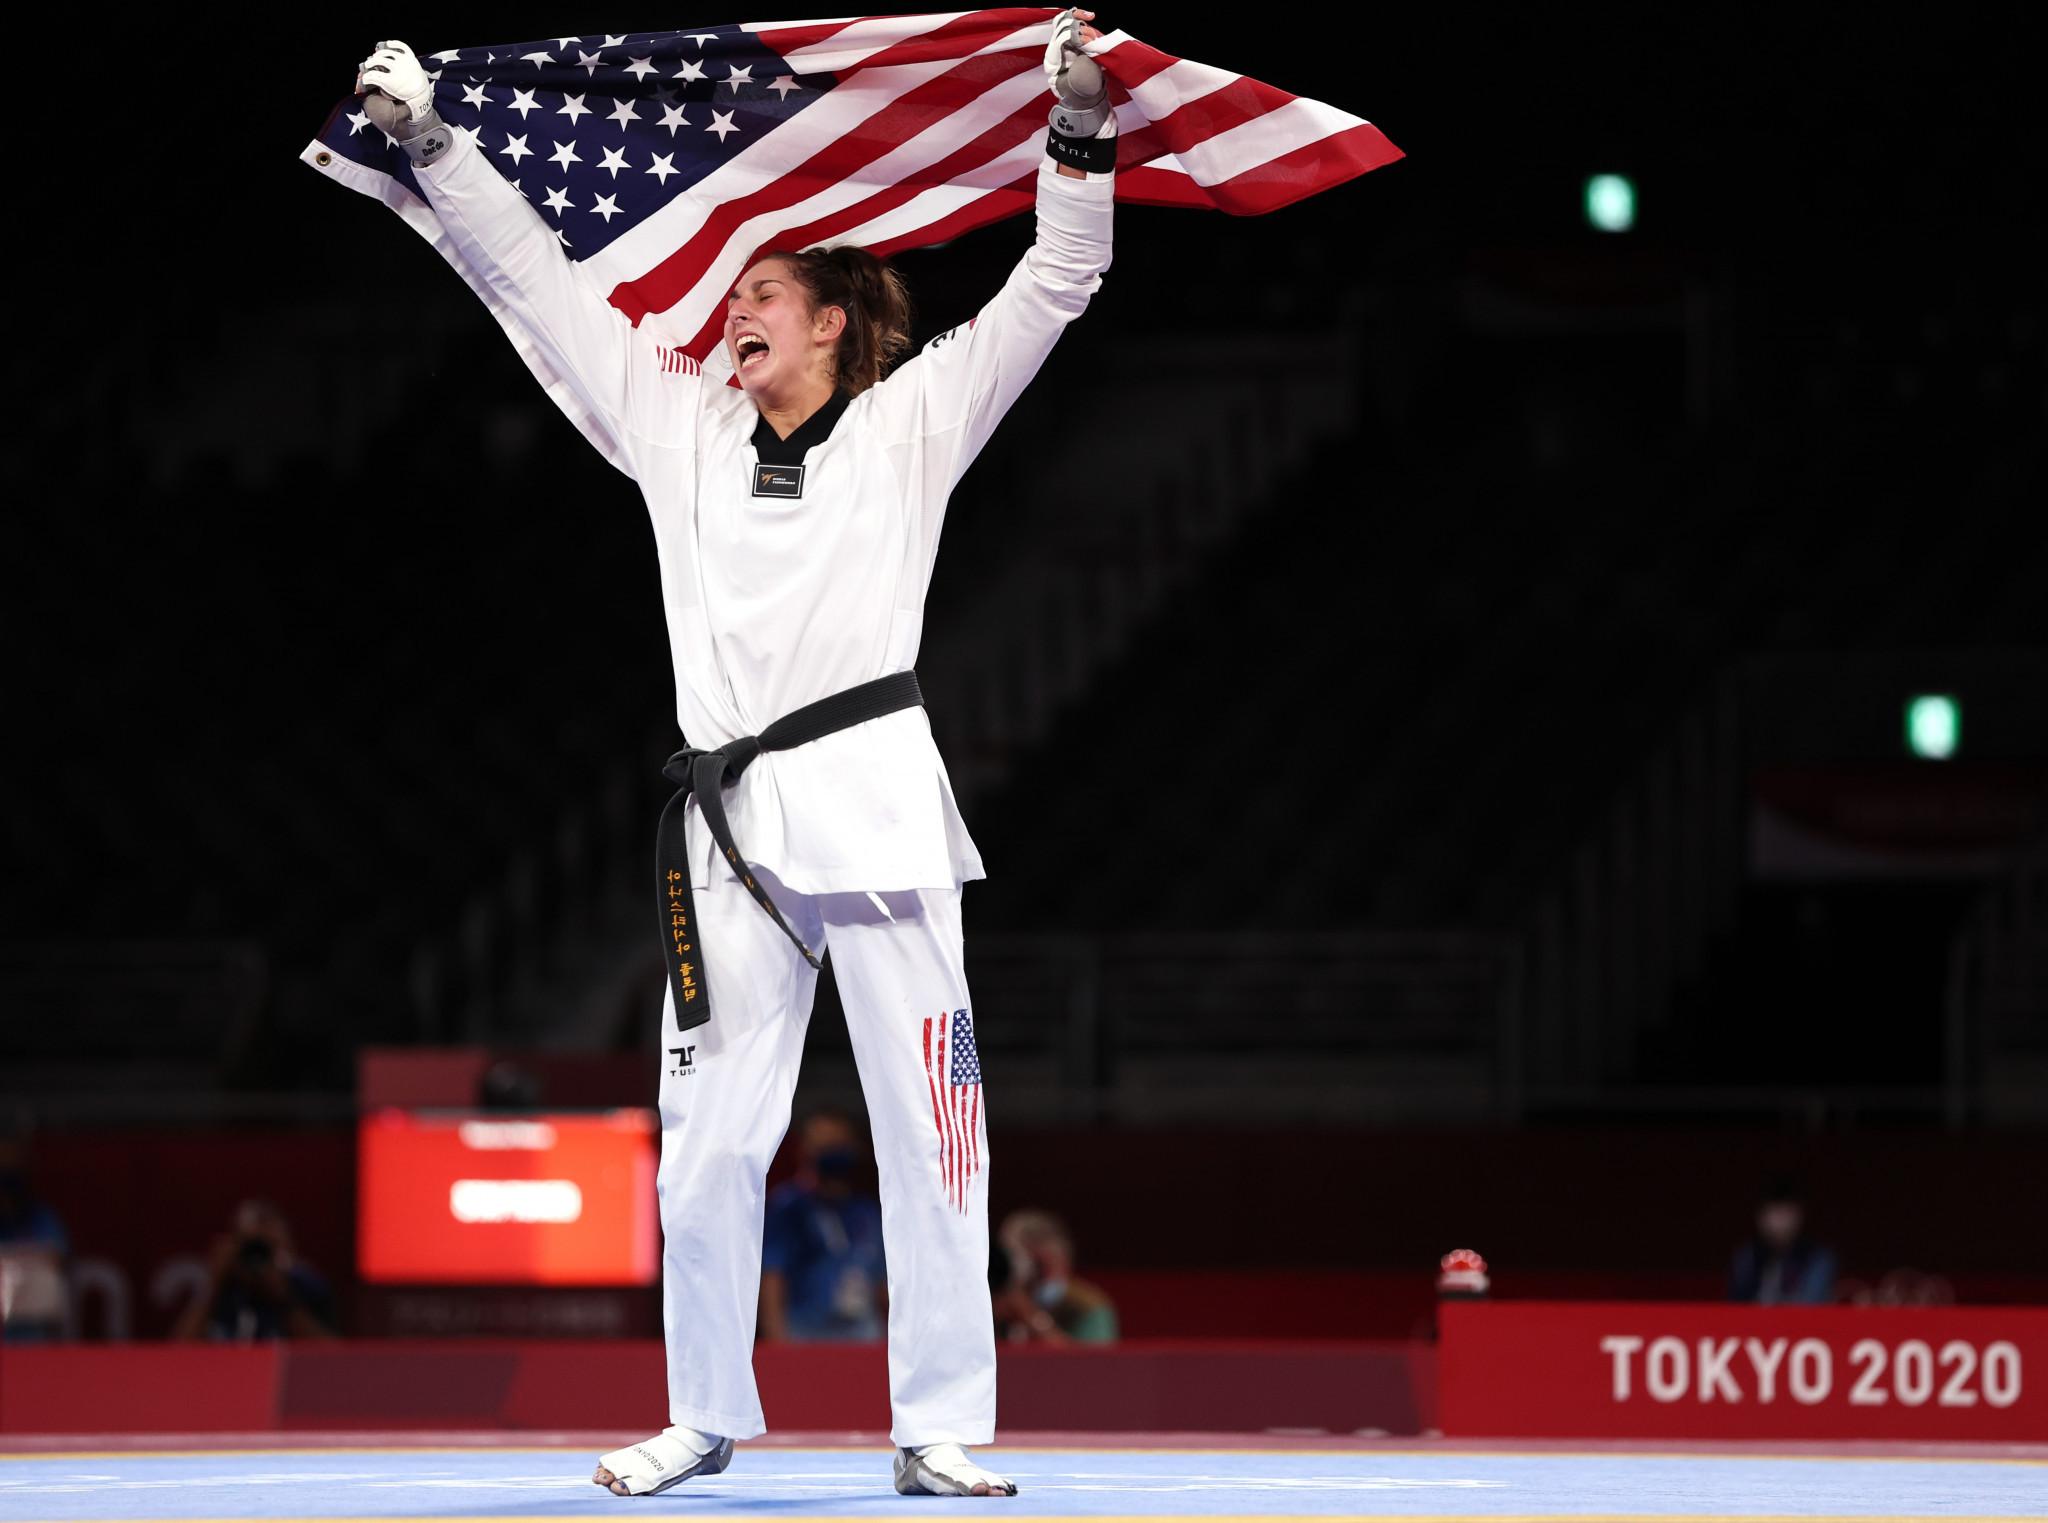 Anastasija Zolotic won Olympic taekwondo gold for the United States at Tokyo 2020 ©Getty Images